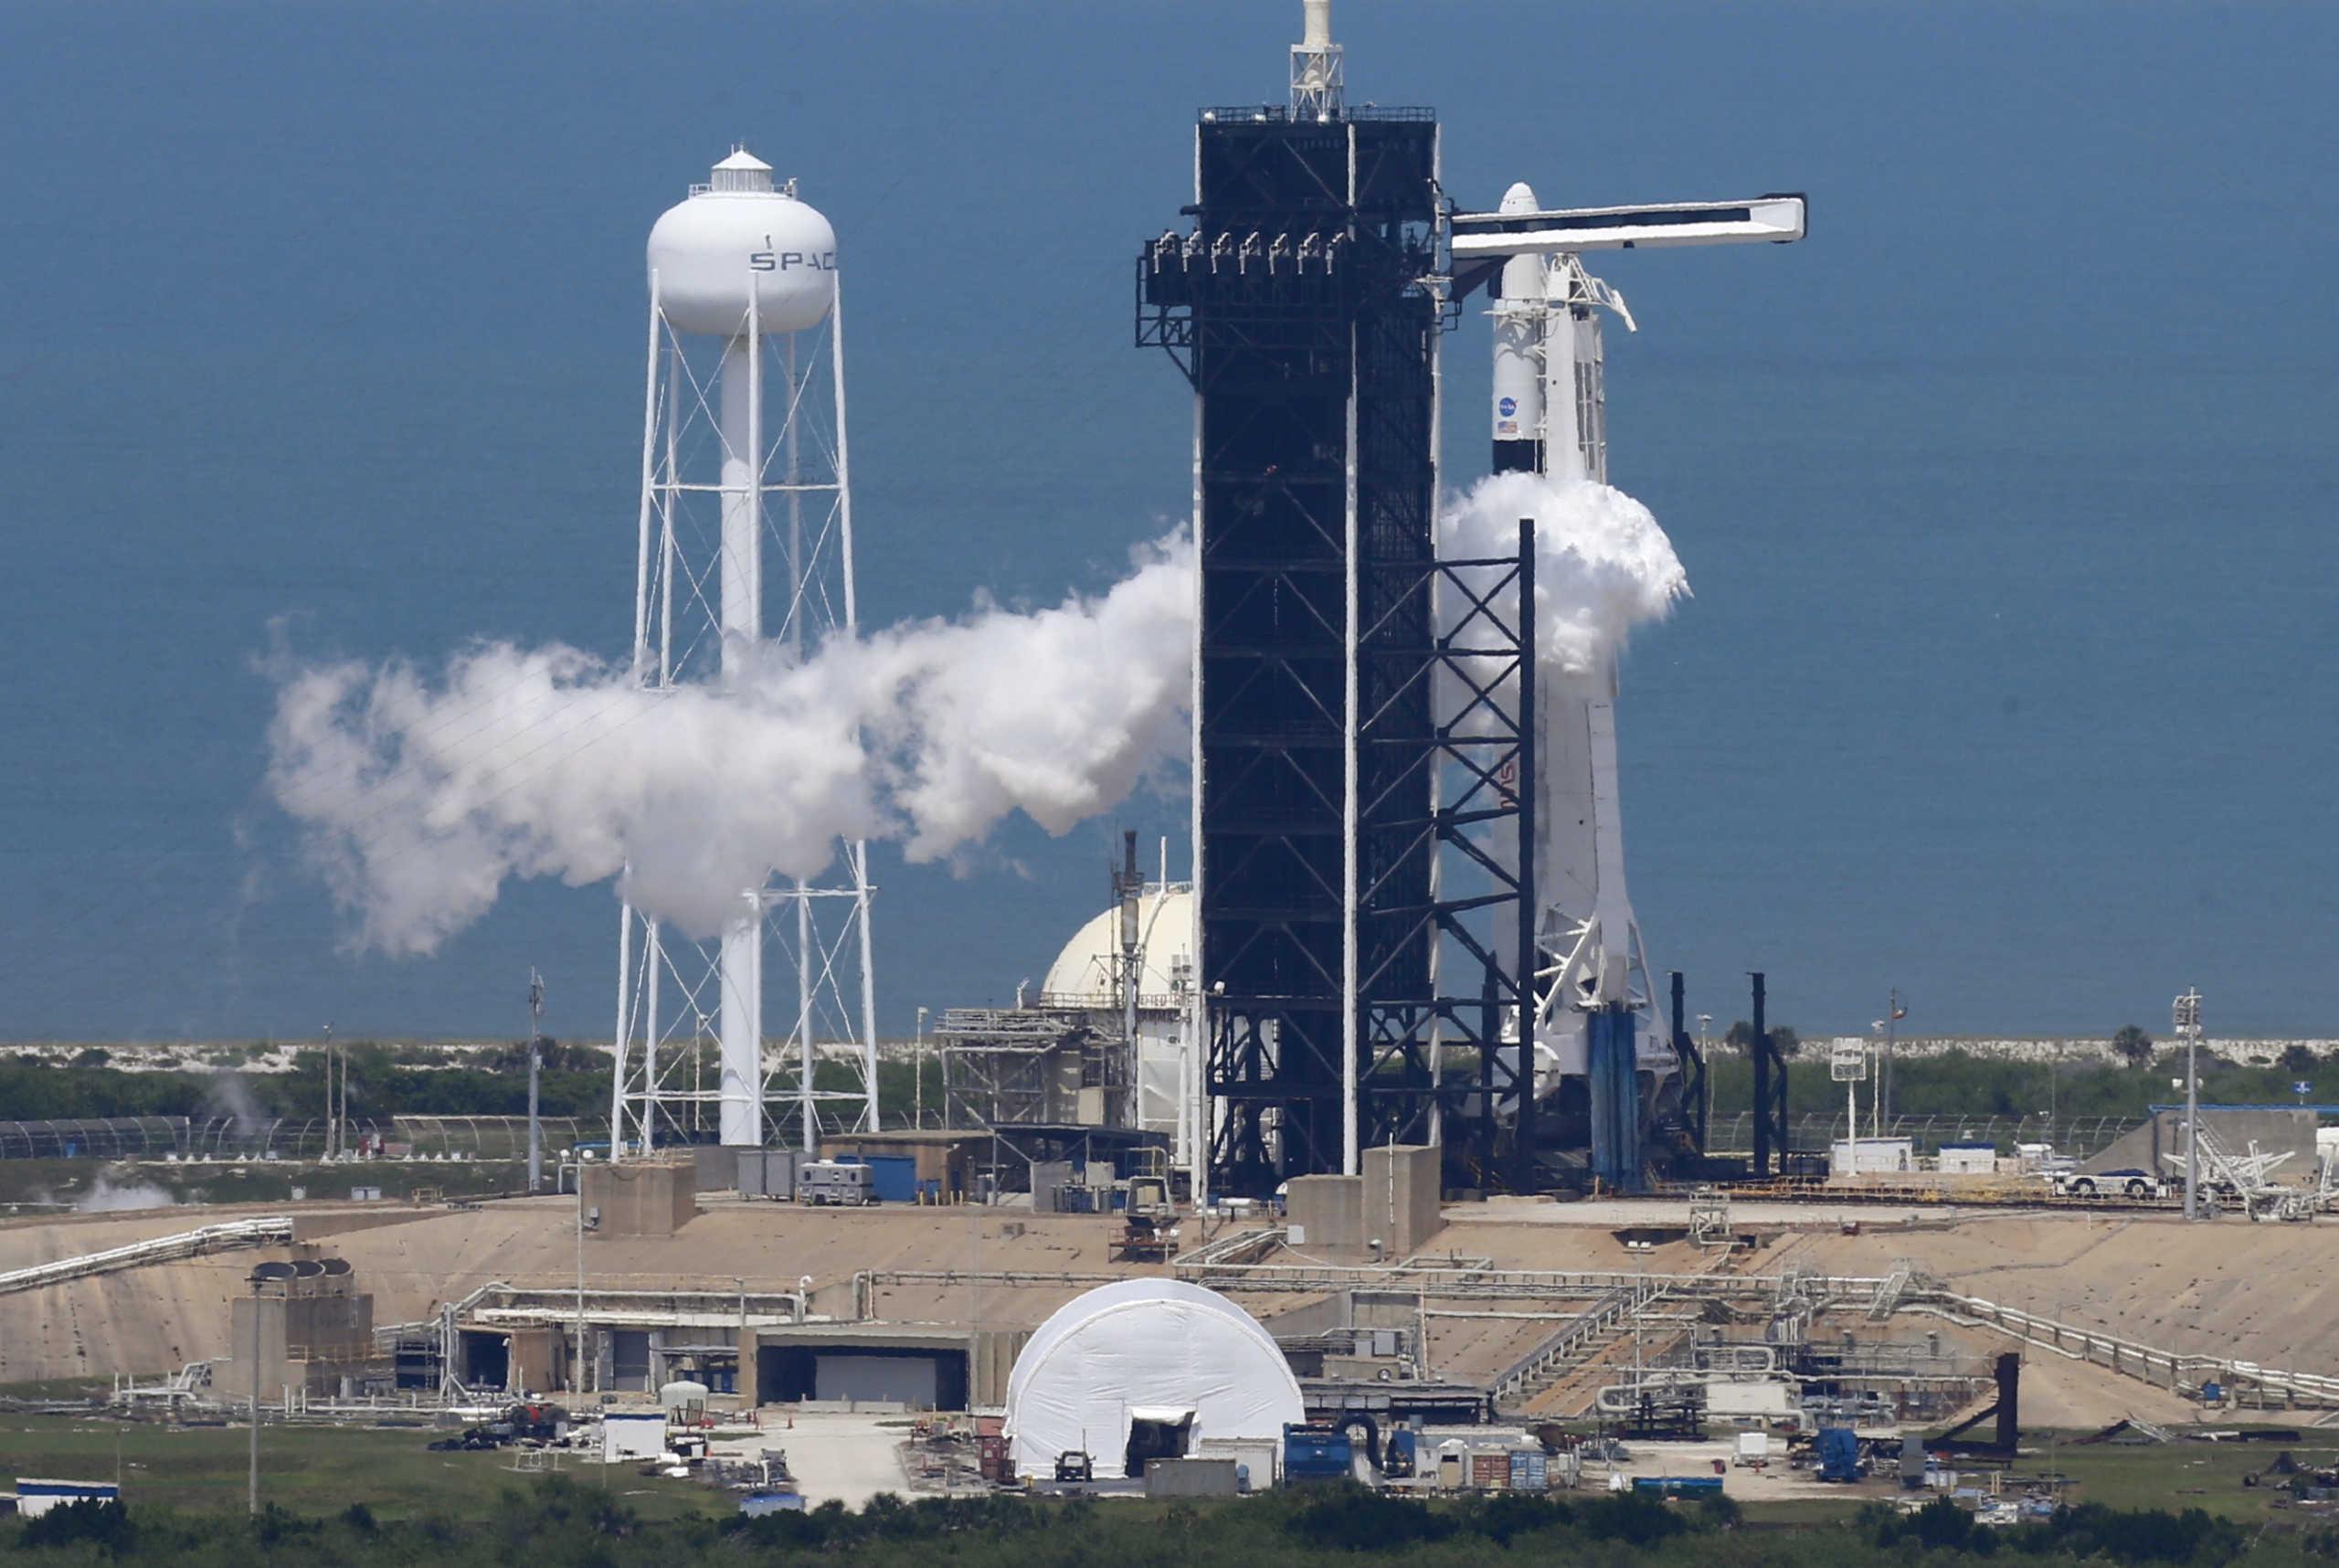 LIVE: Ιστορικές στιγμές – Εκτοξεύθηκε το SpaceX